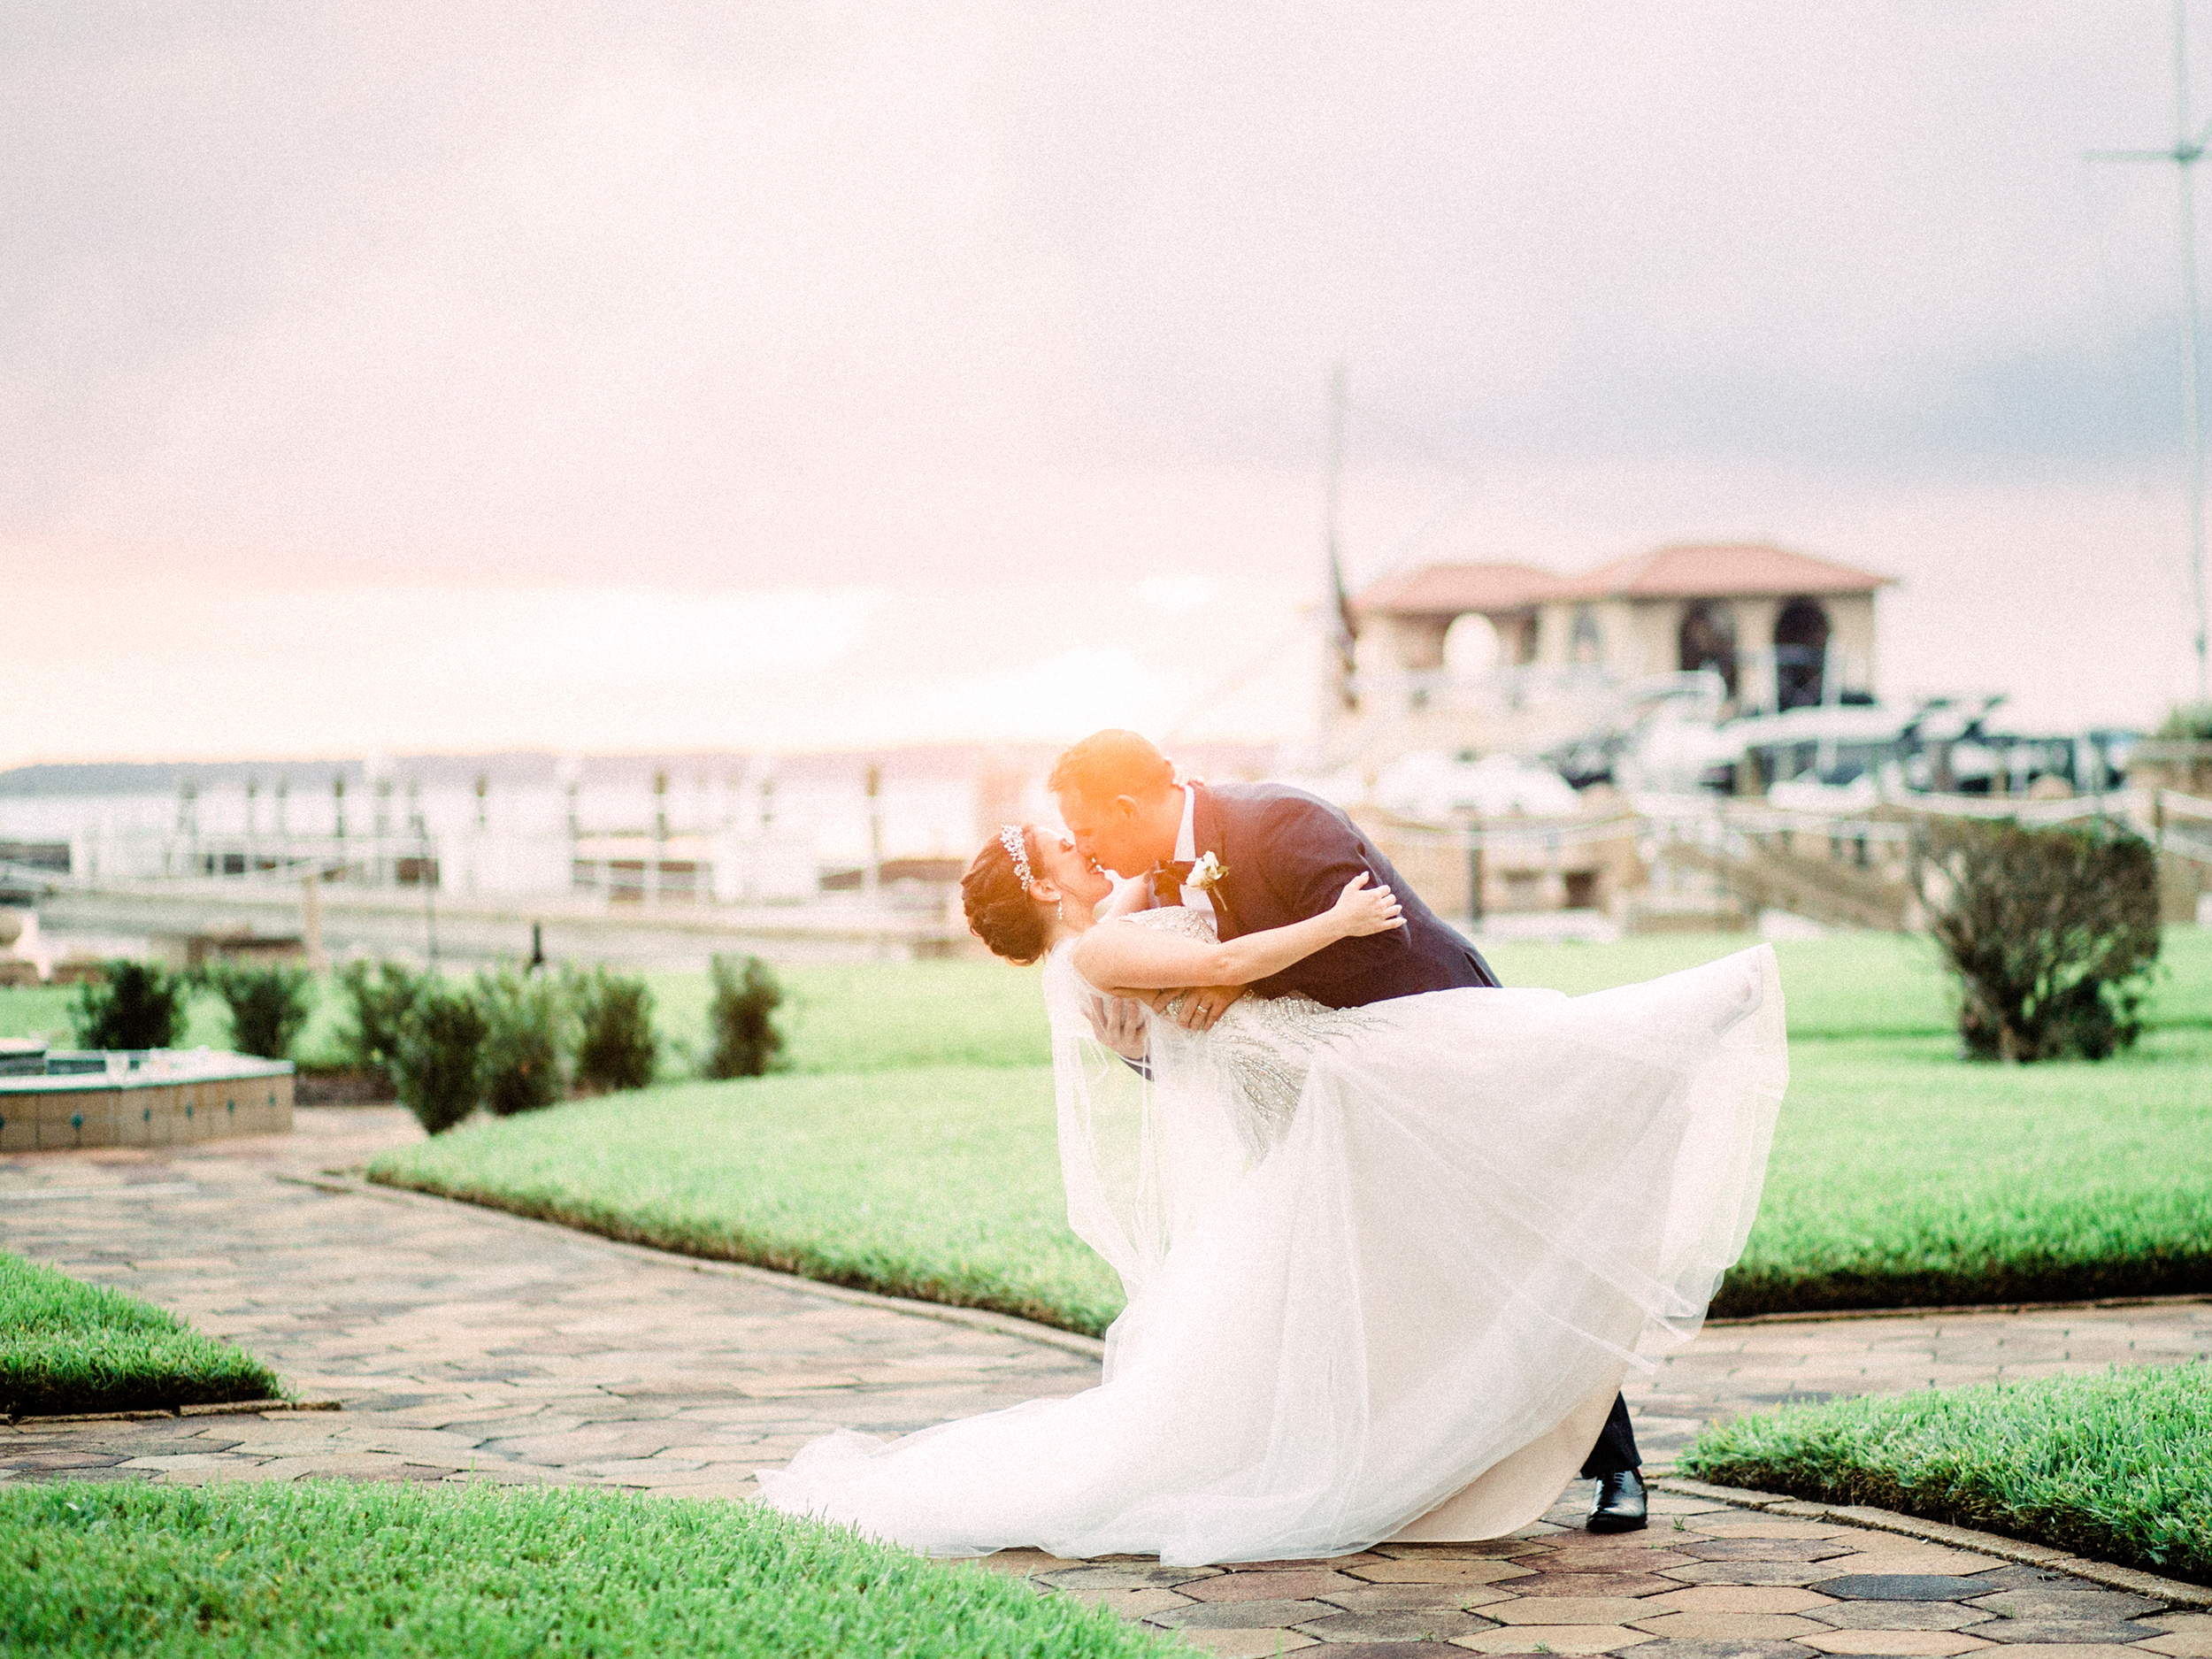 Lisa Silva Photography- Jacksonville, Florida Fine Art Film Wedding Photography Epping Forrest Yacht Club 1.jpg